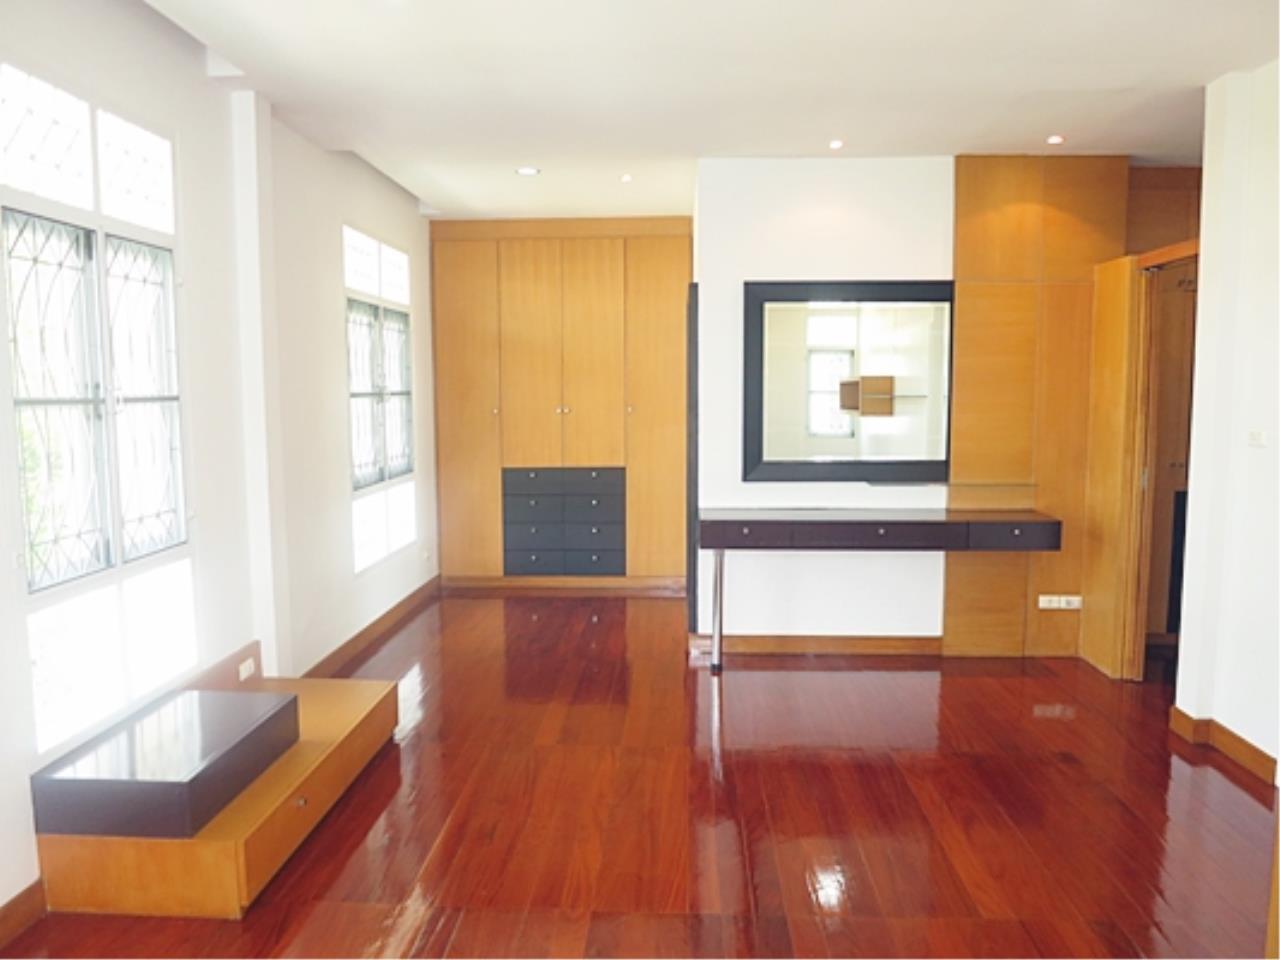 Estate Corner Agency (Samut Prakan) Agency's Single house for sale Ladprao, fully furnished. 17